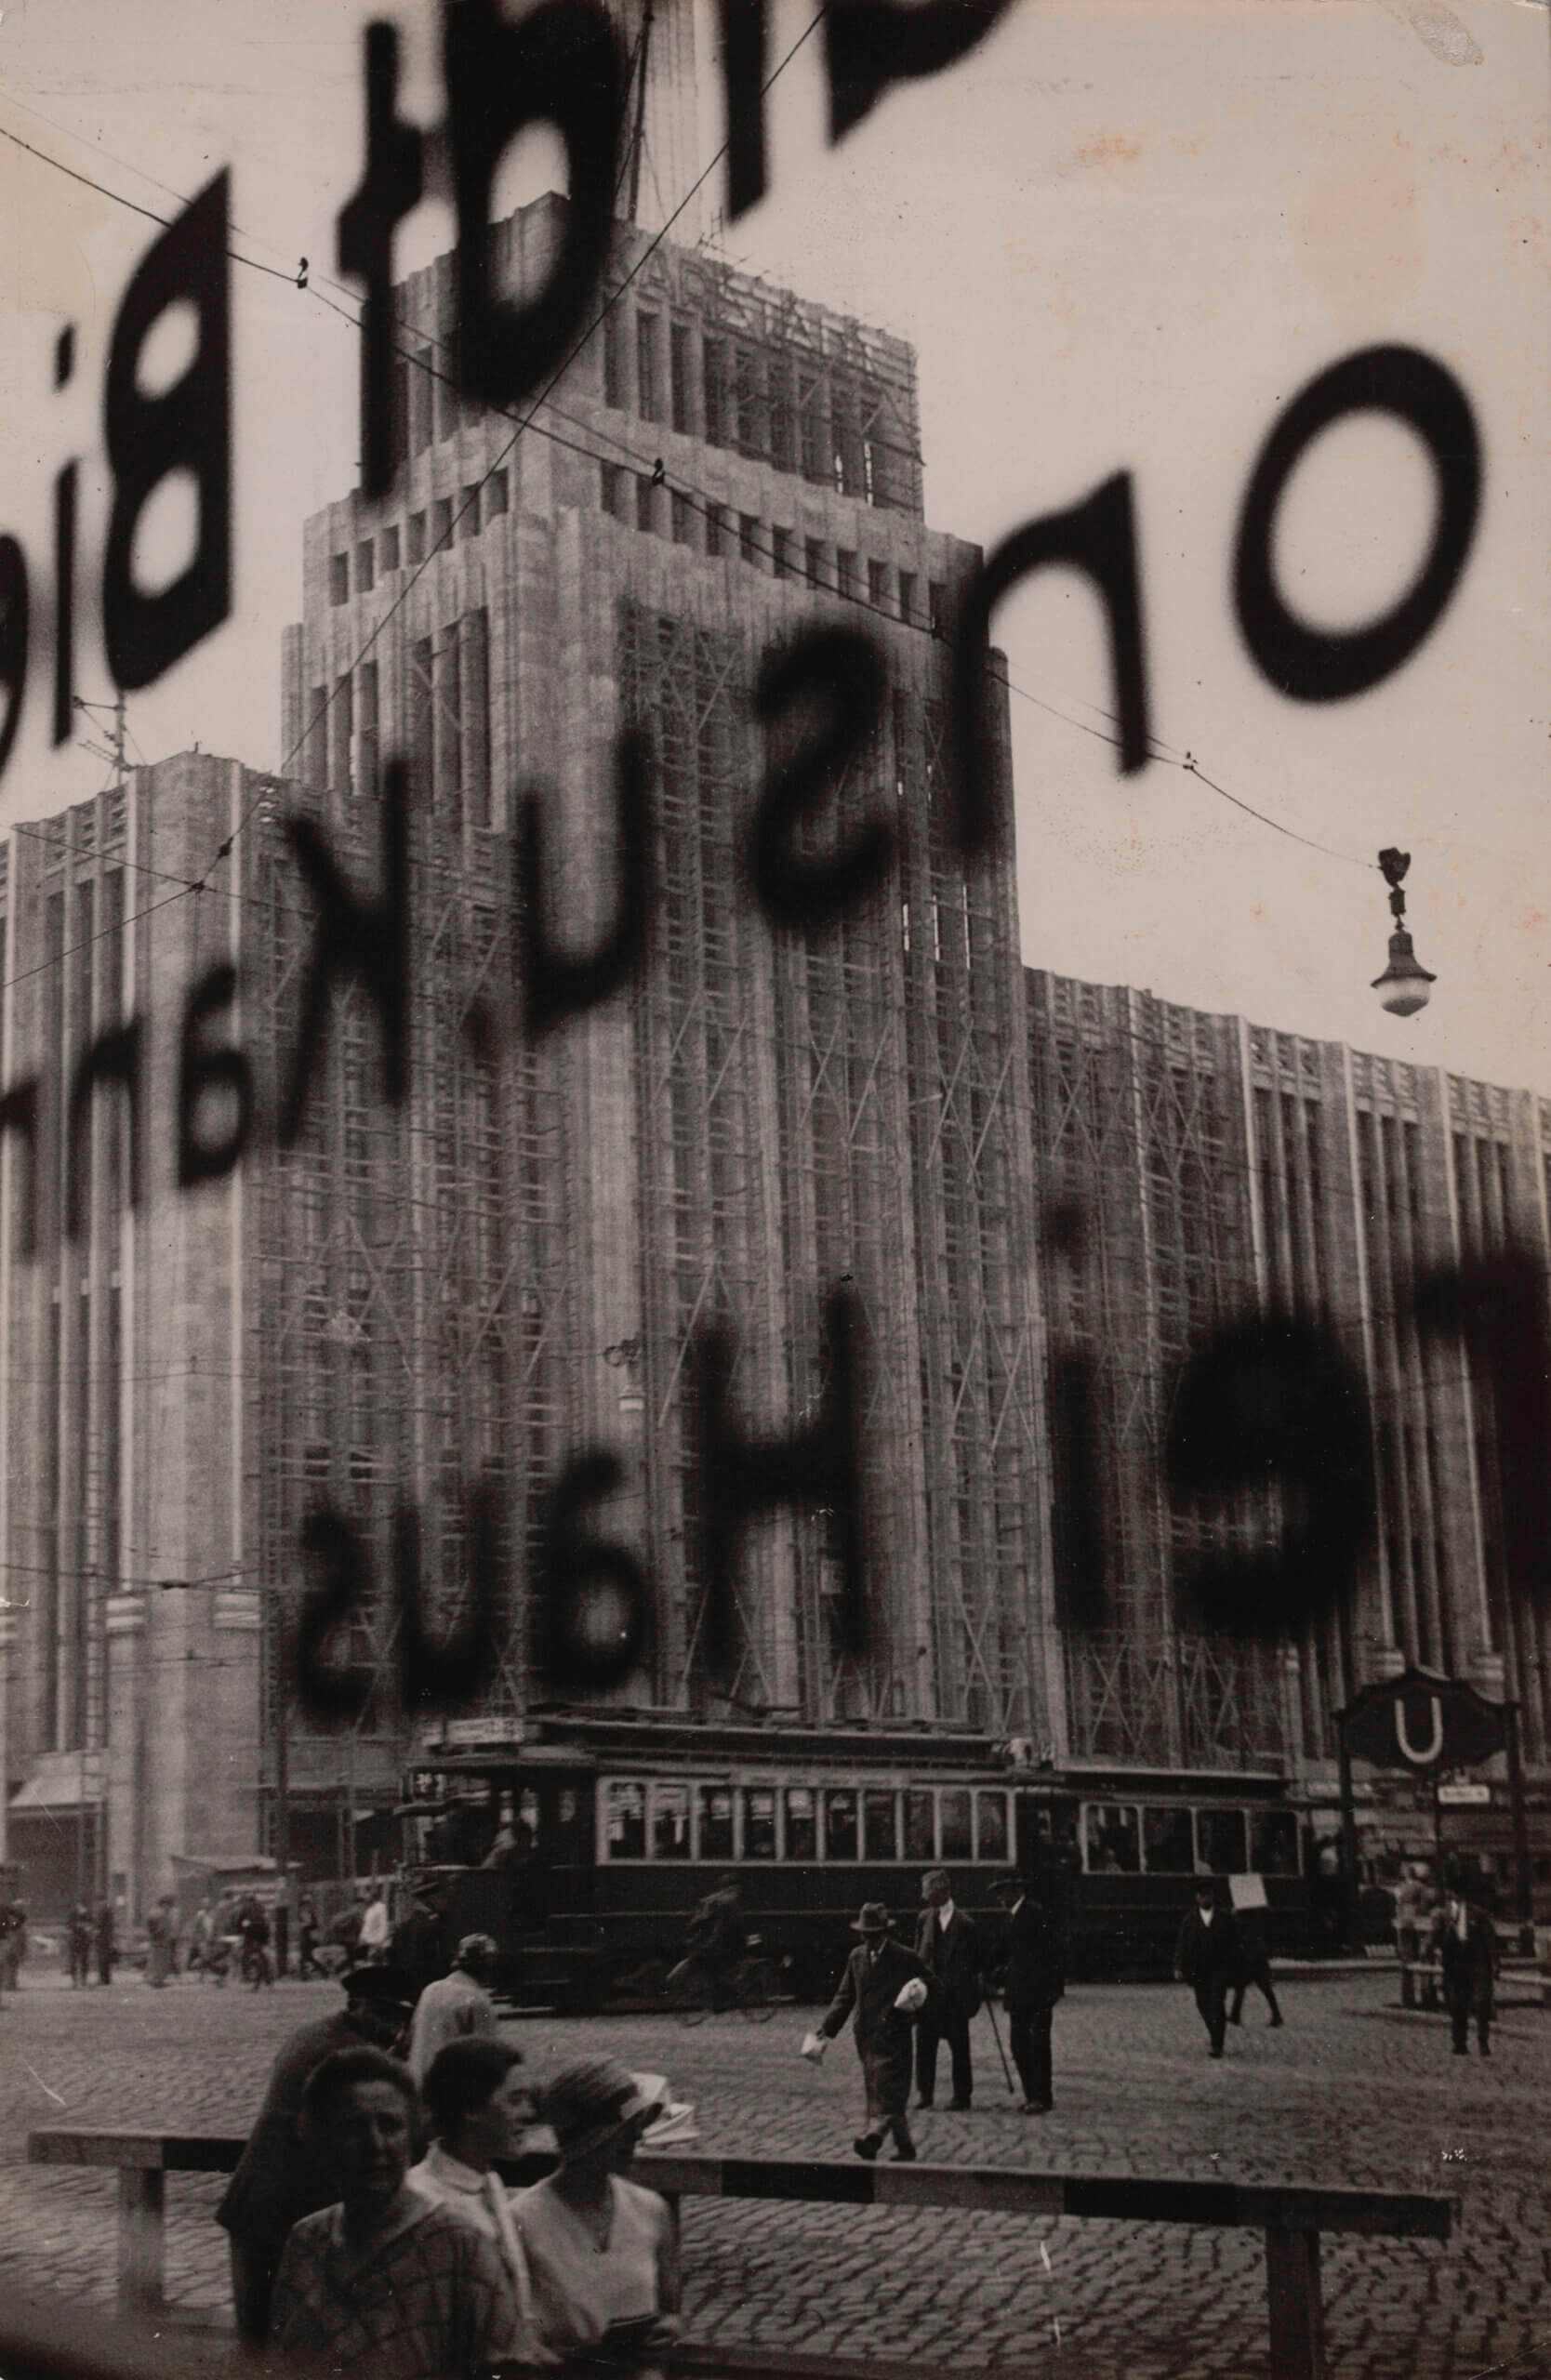 Vue du grand magasin berlinois Karstadt